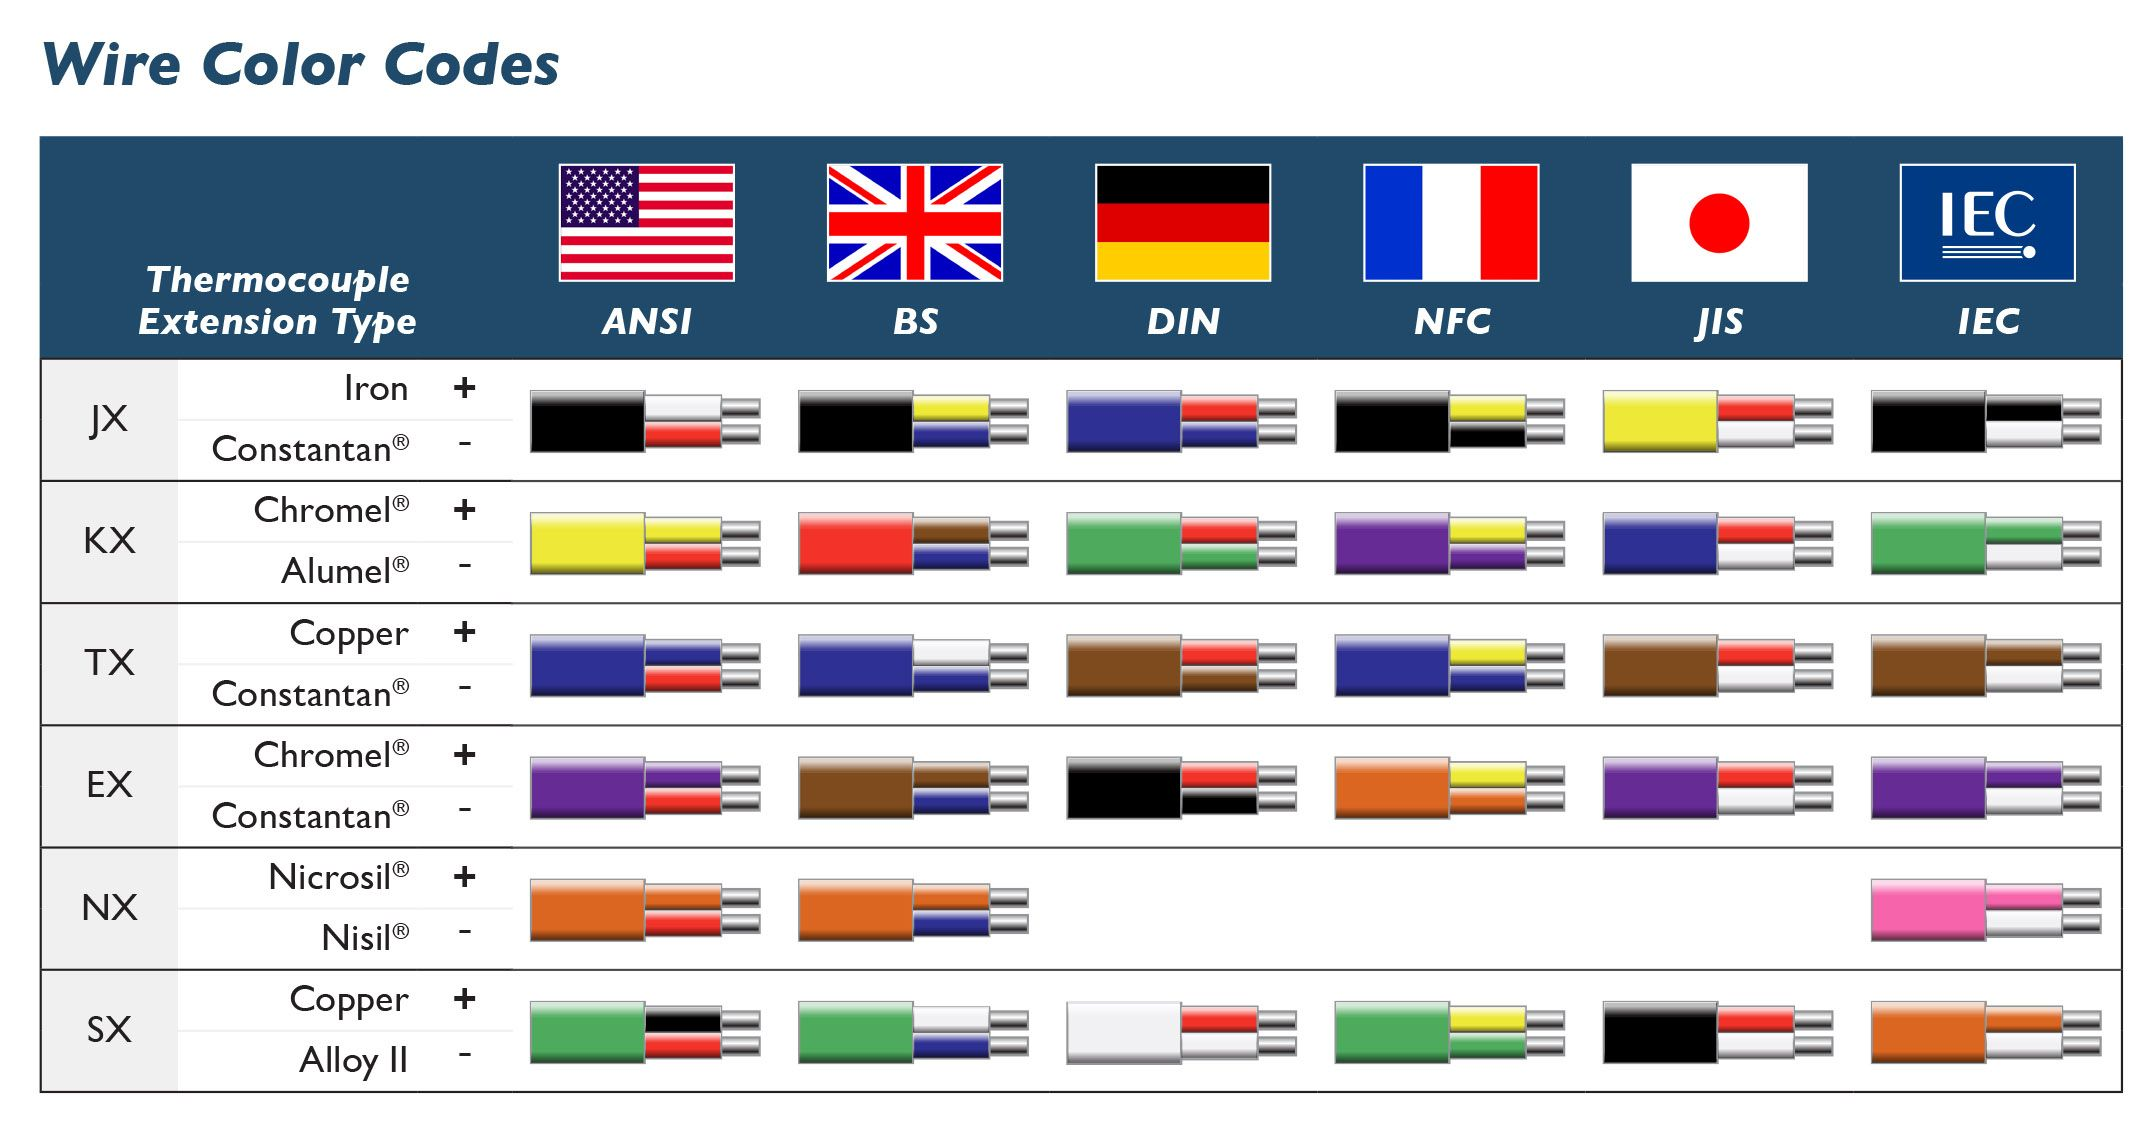 American Wiring Color Code Wiring Diagram Yer Wiring Color Code Chart Homes American Electrical Wiring Colors Electrical Wiring Colours Color Coding Ac Wiring